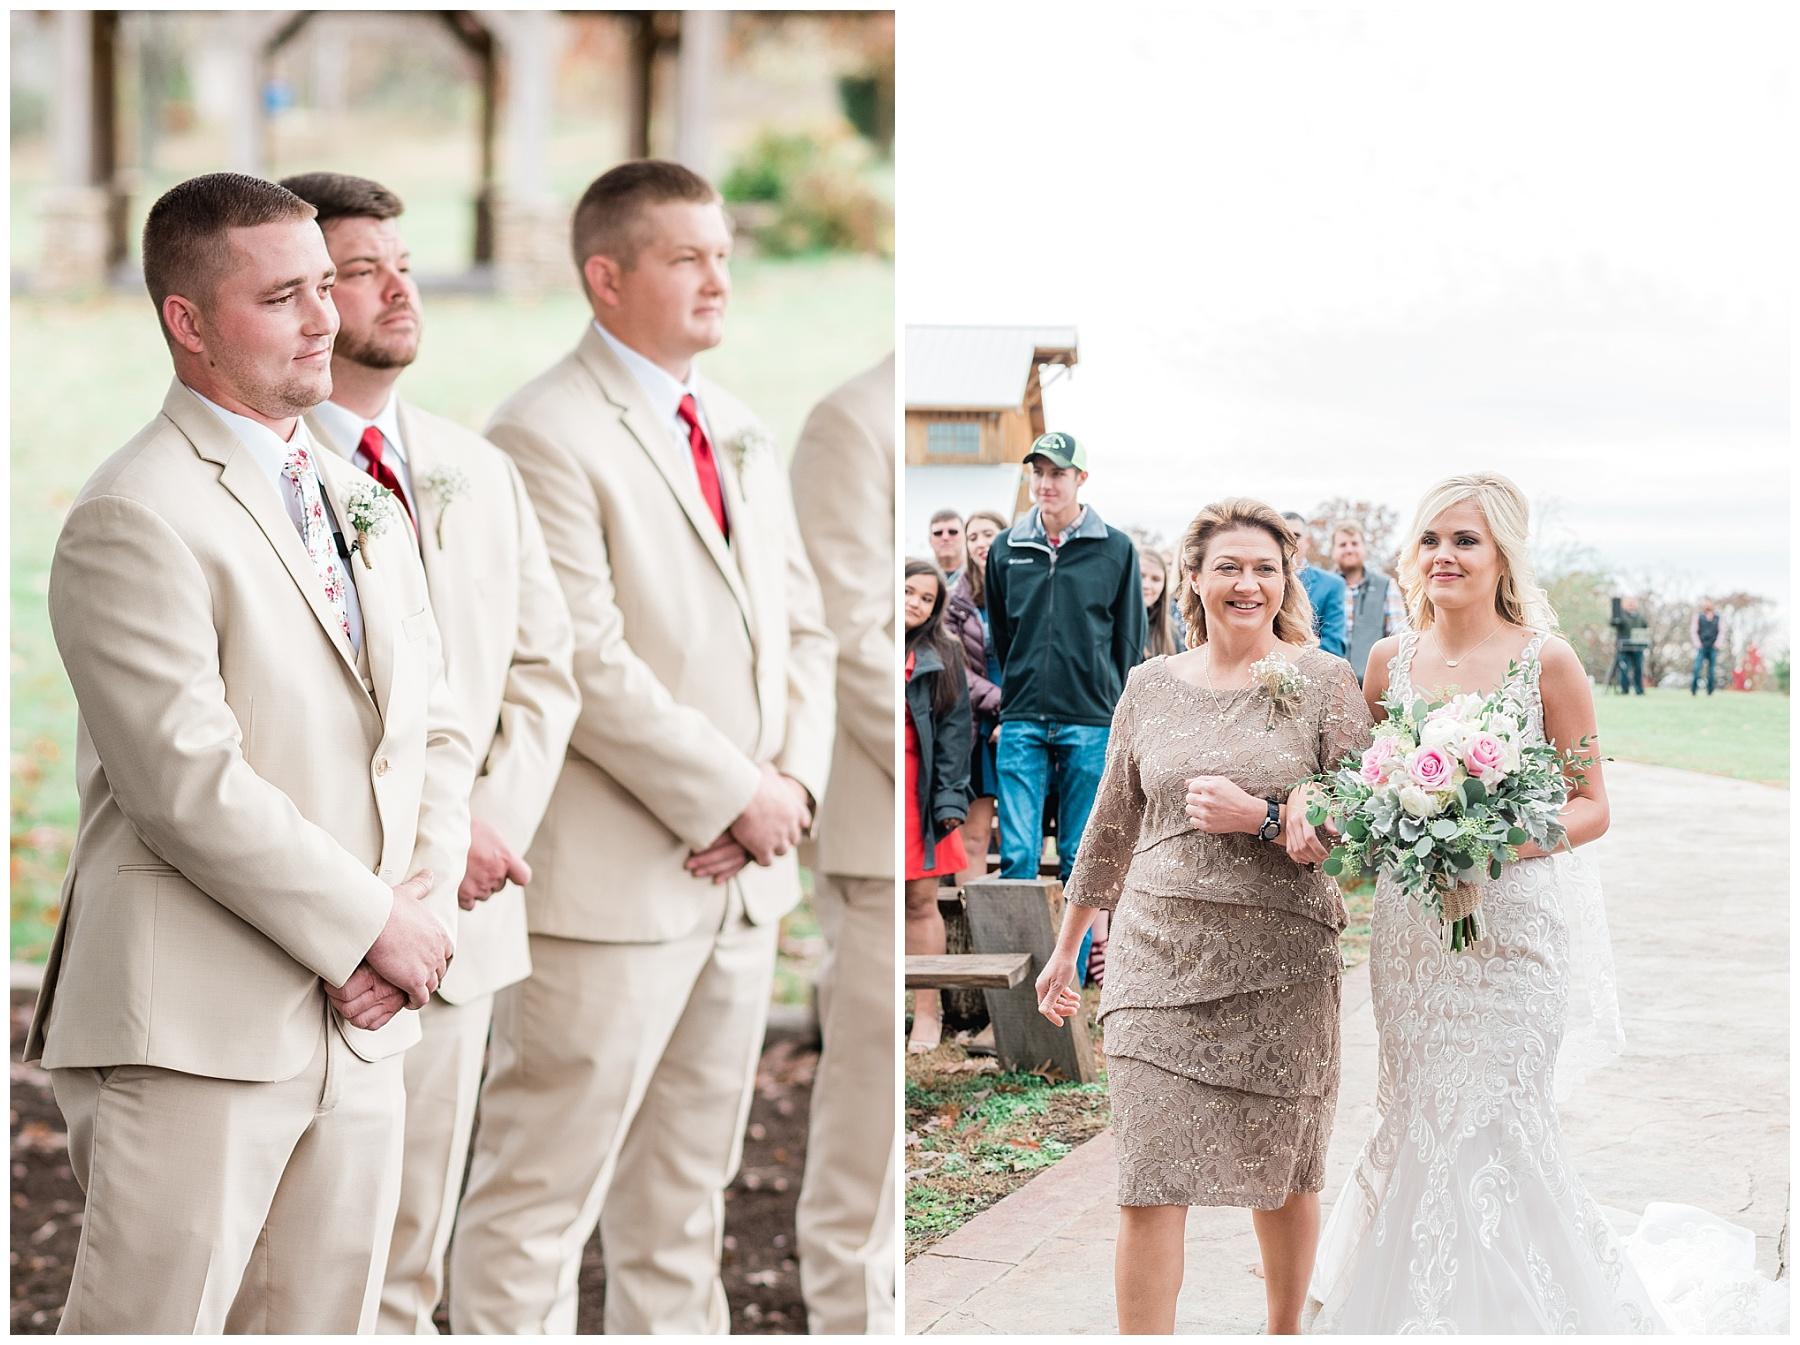 Lakeside Wedding in Fall at Mighty Oak Lodge by Misouri Wedding Photographer Kelsi Kliethermes Photography_0030.jpg